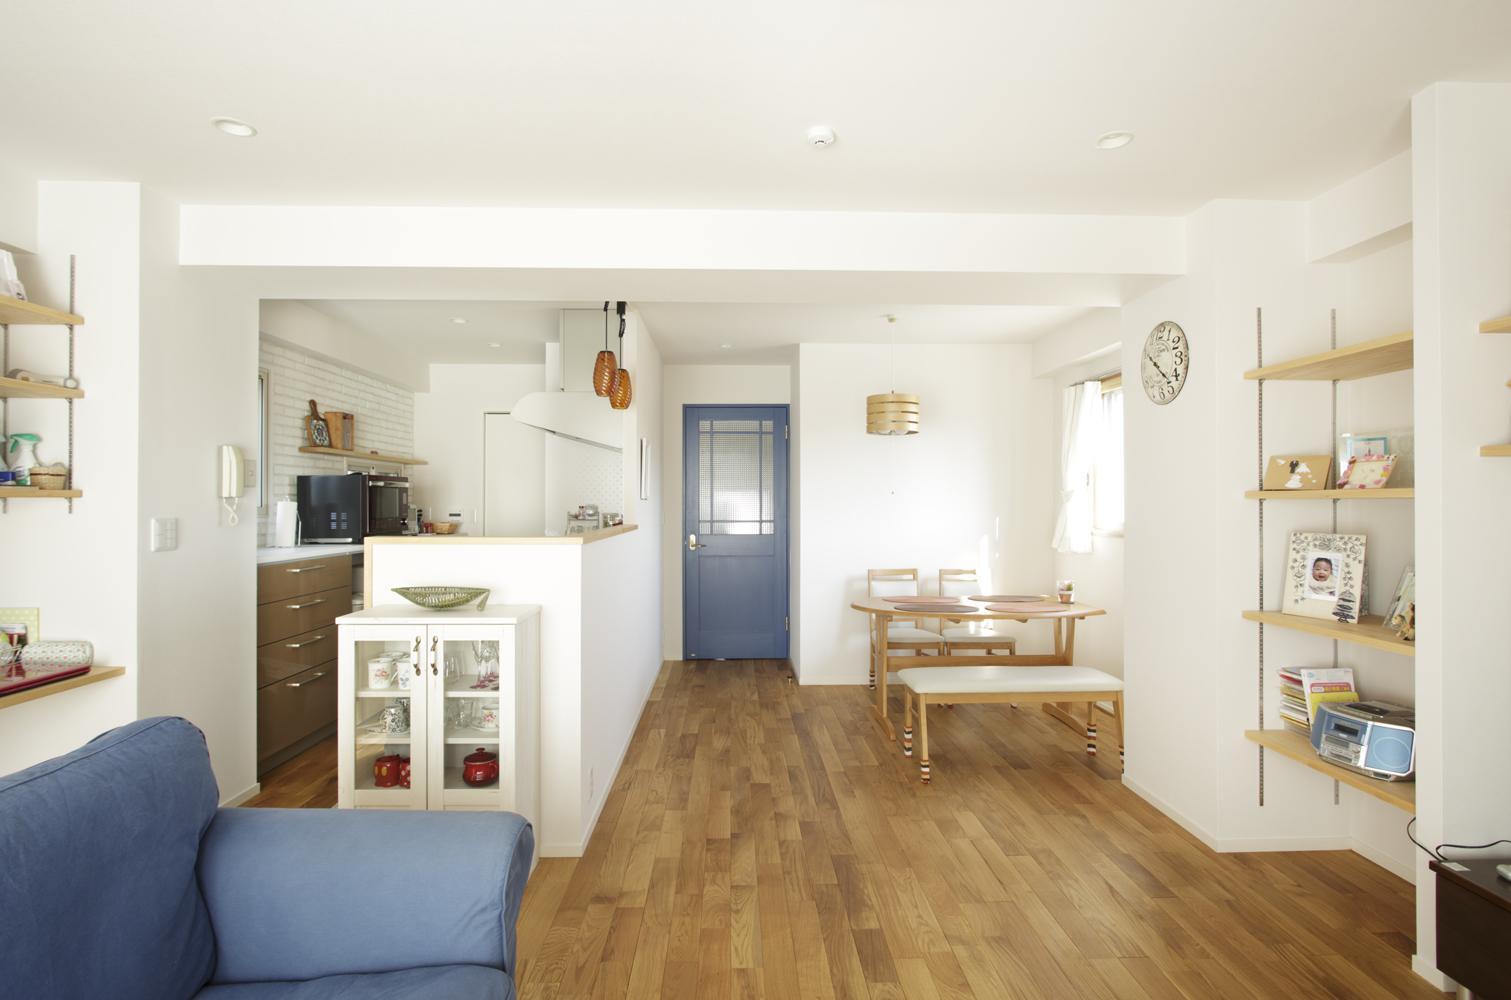 S邸・二人のベビーのために、安心で快適な住まいの部屋 リビング入口を見る